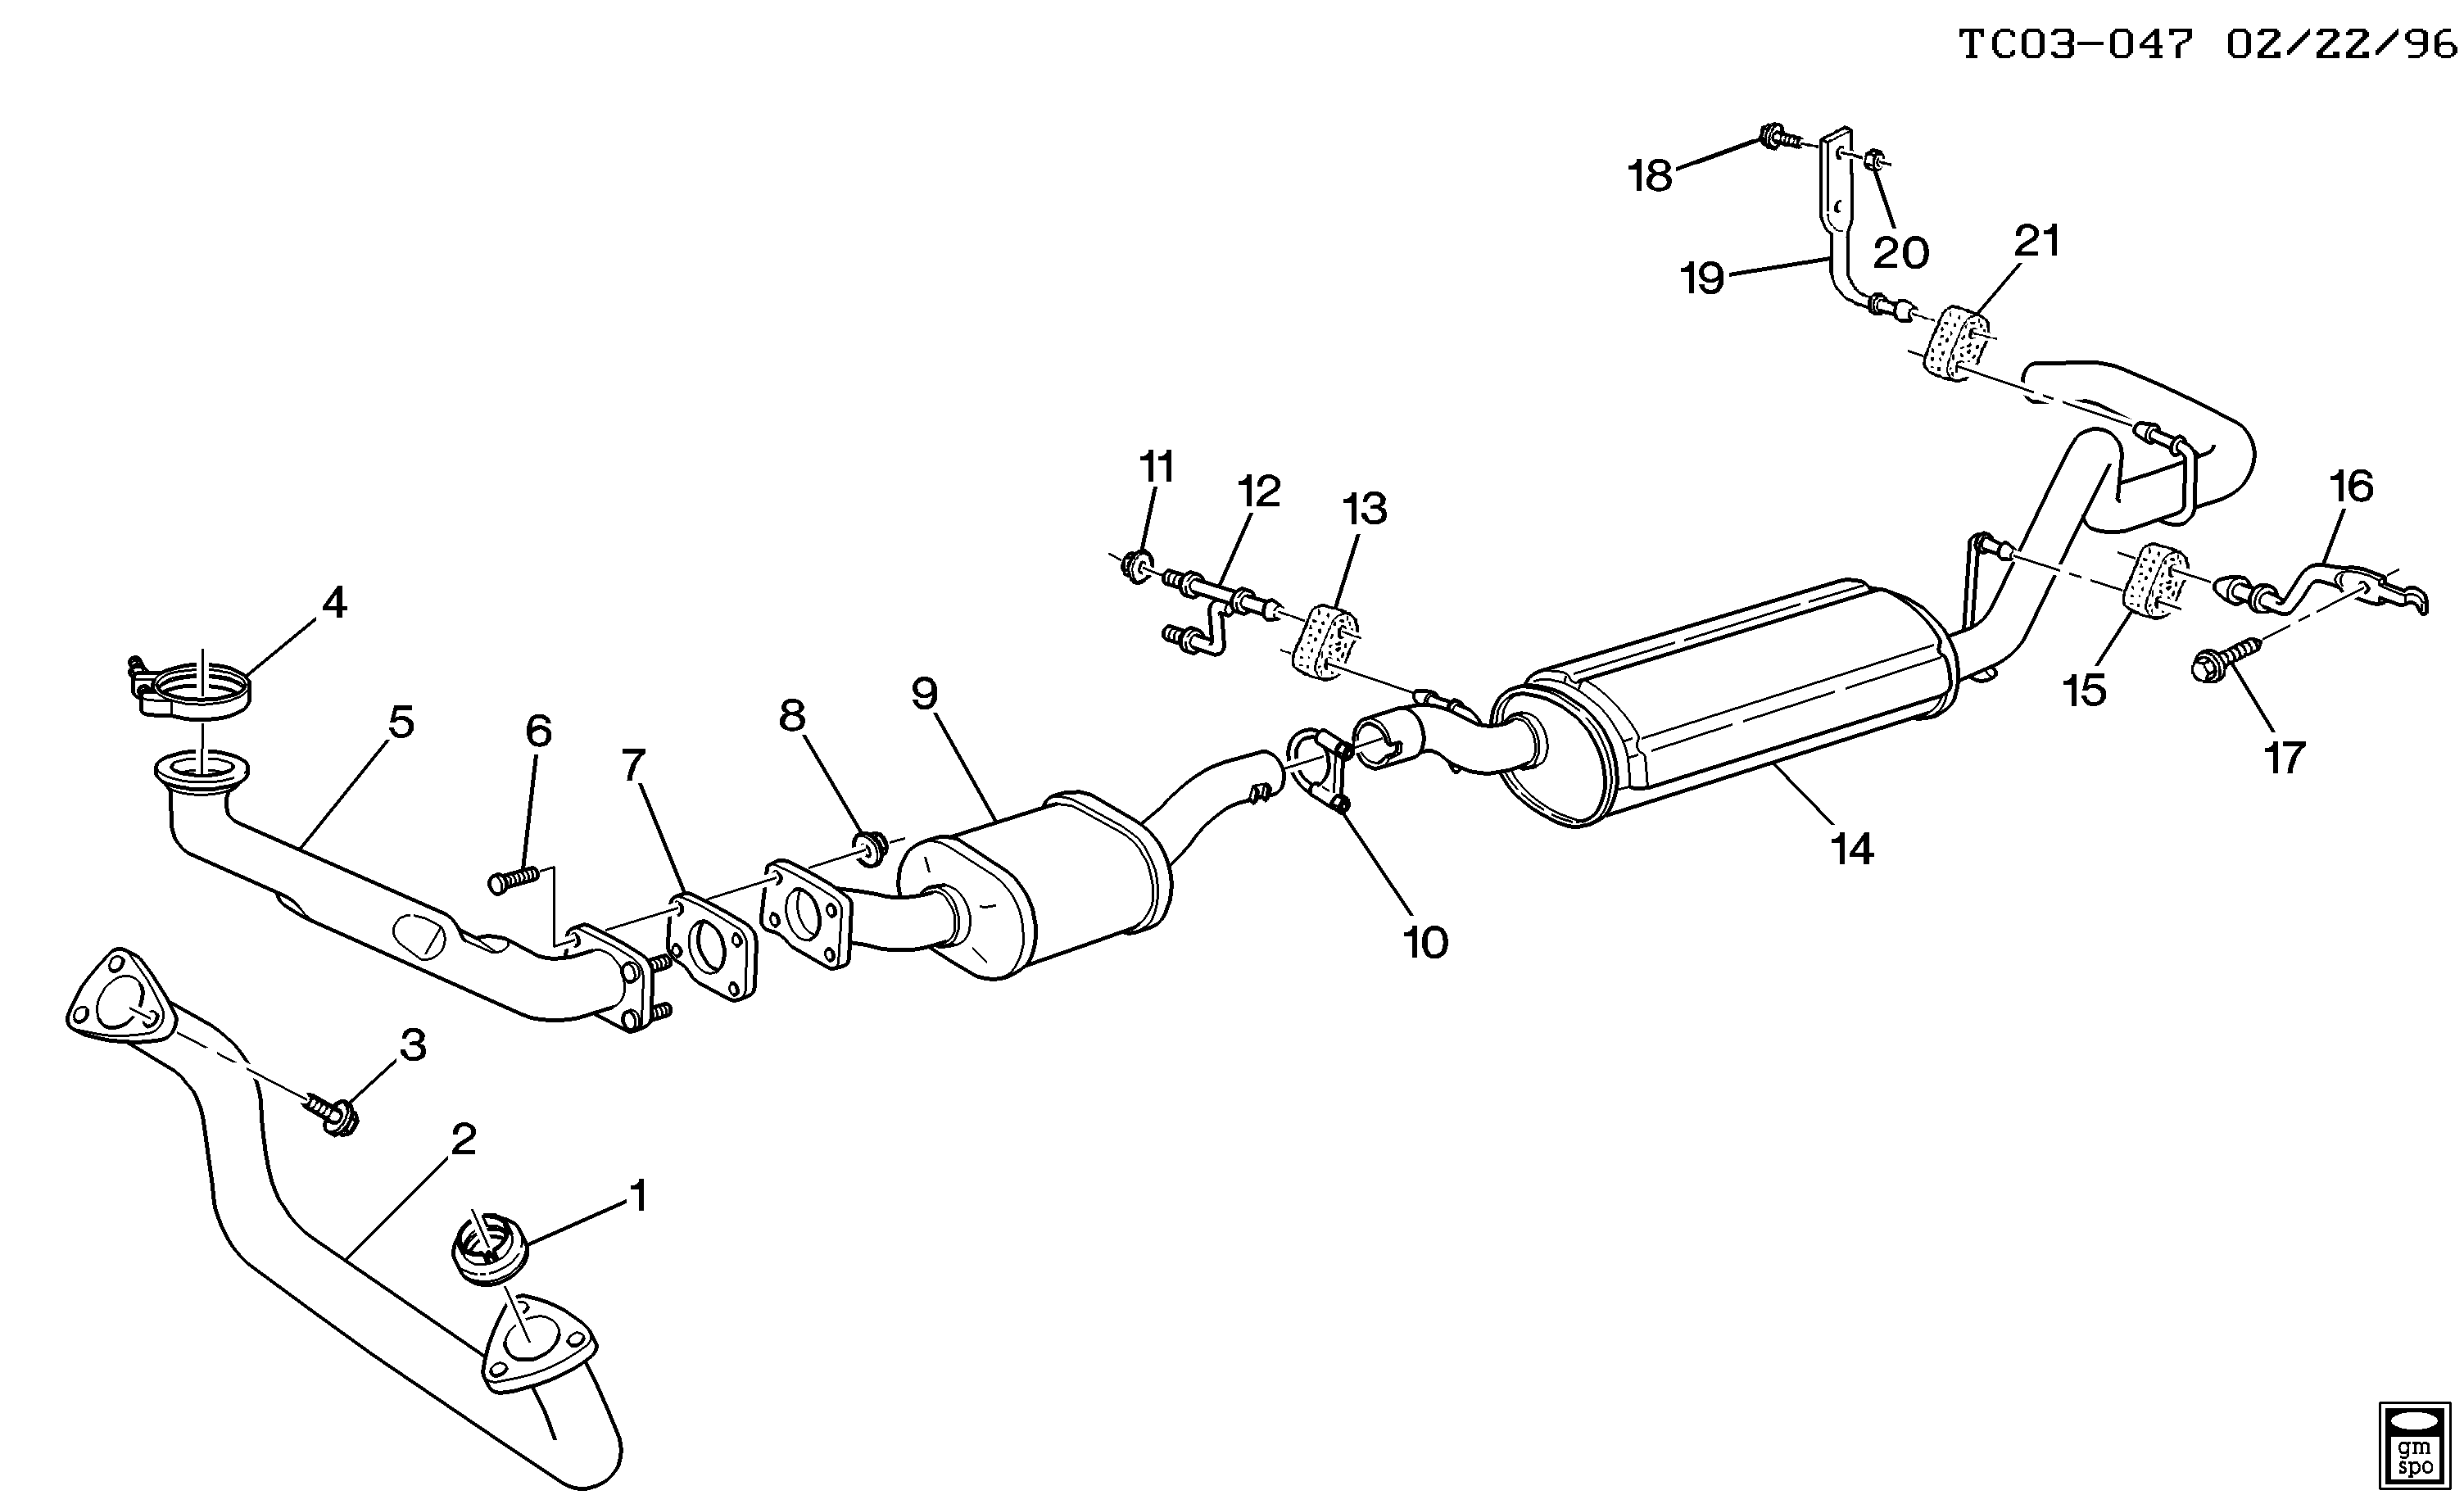 2004 chevy tahoe catalytic